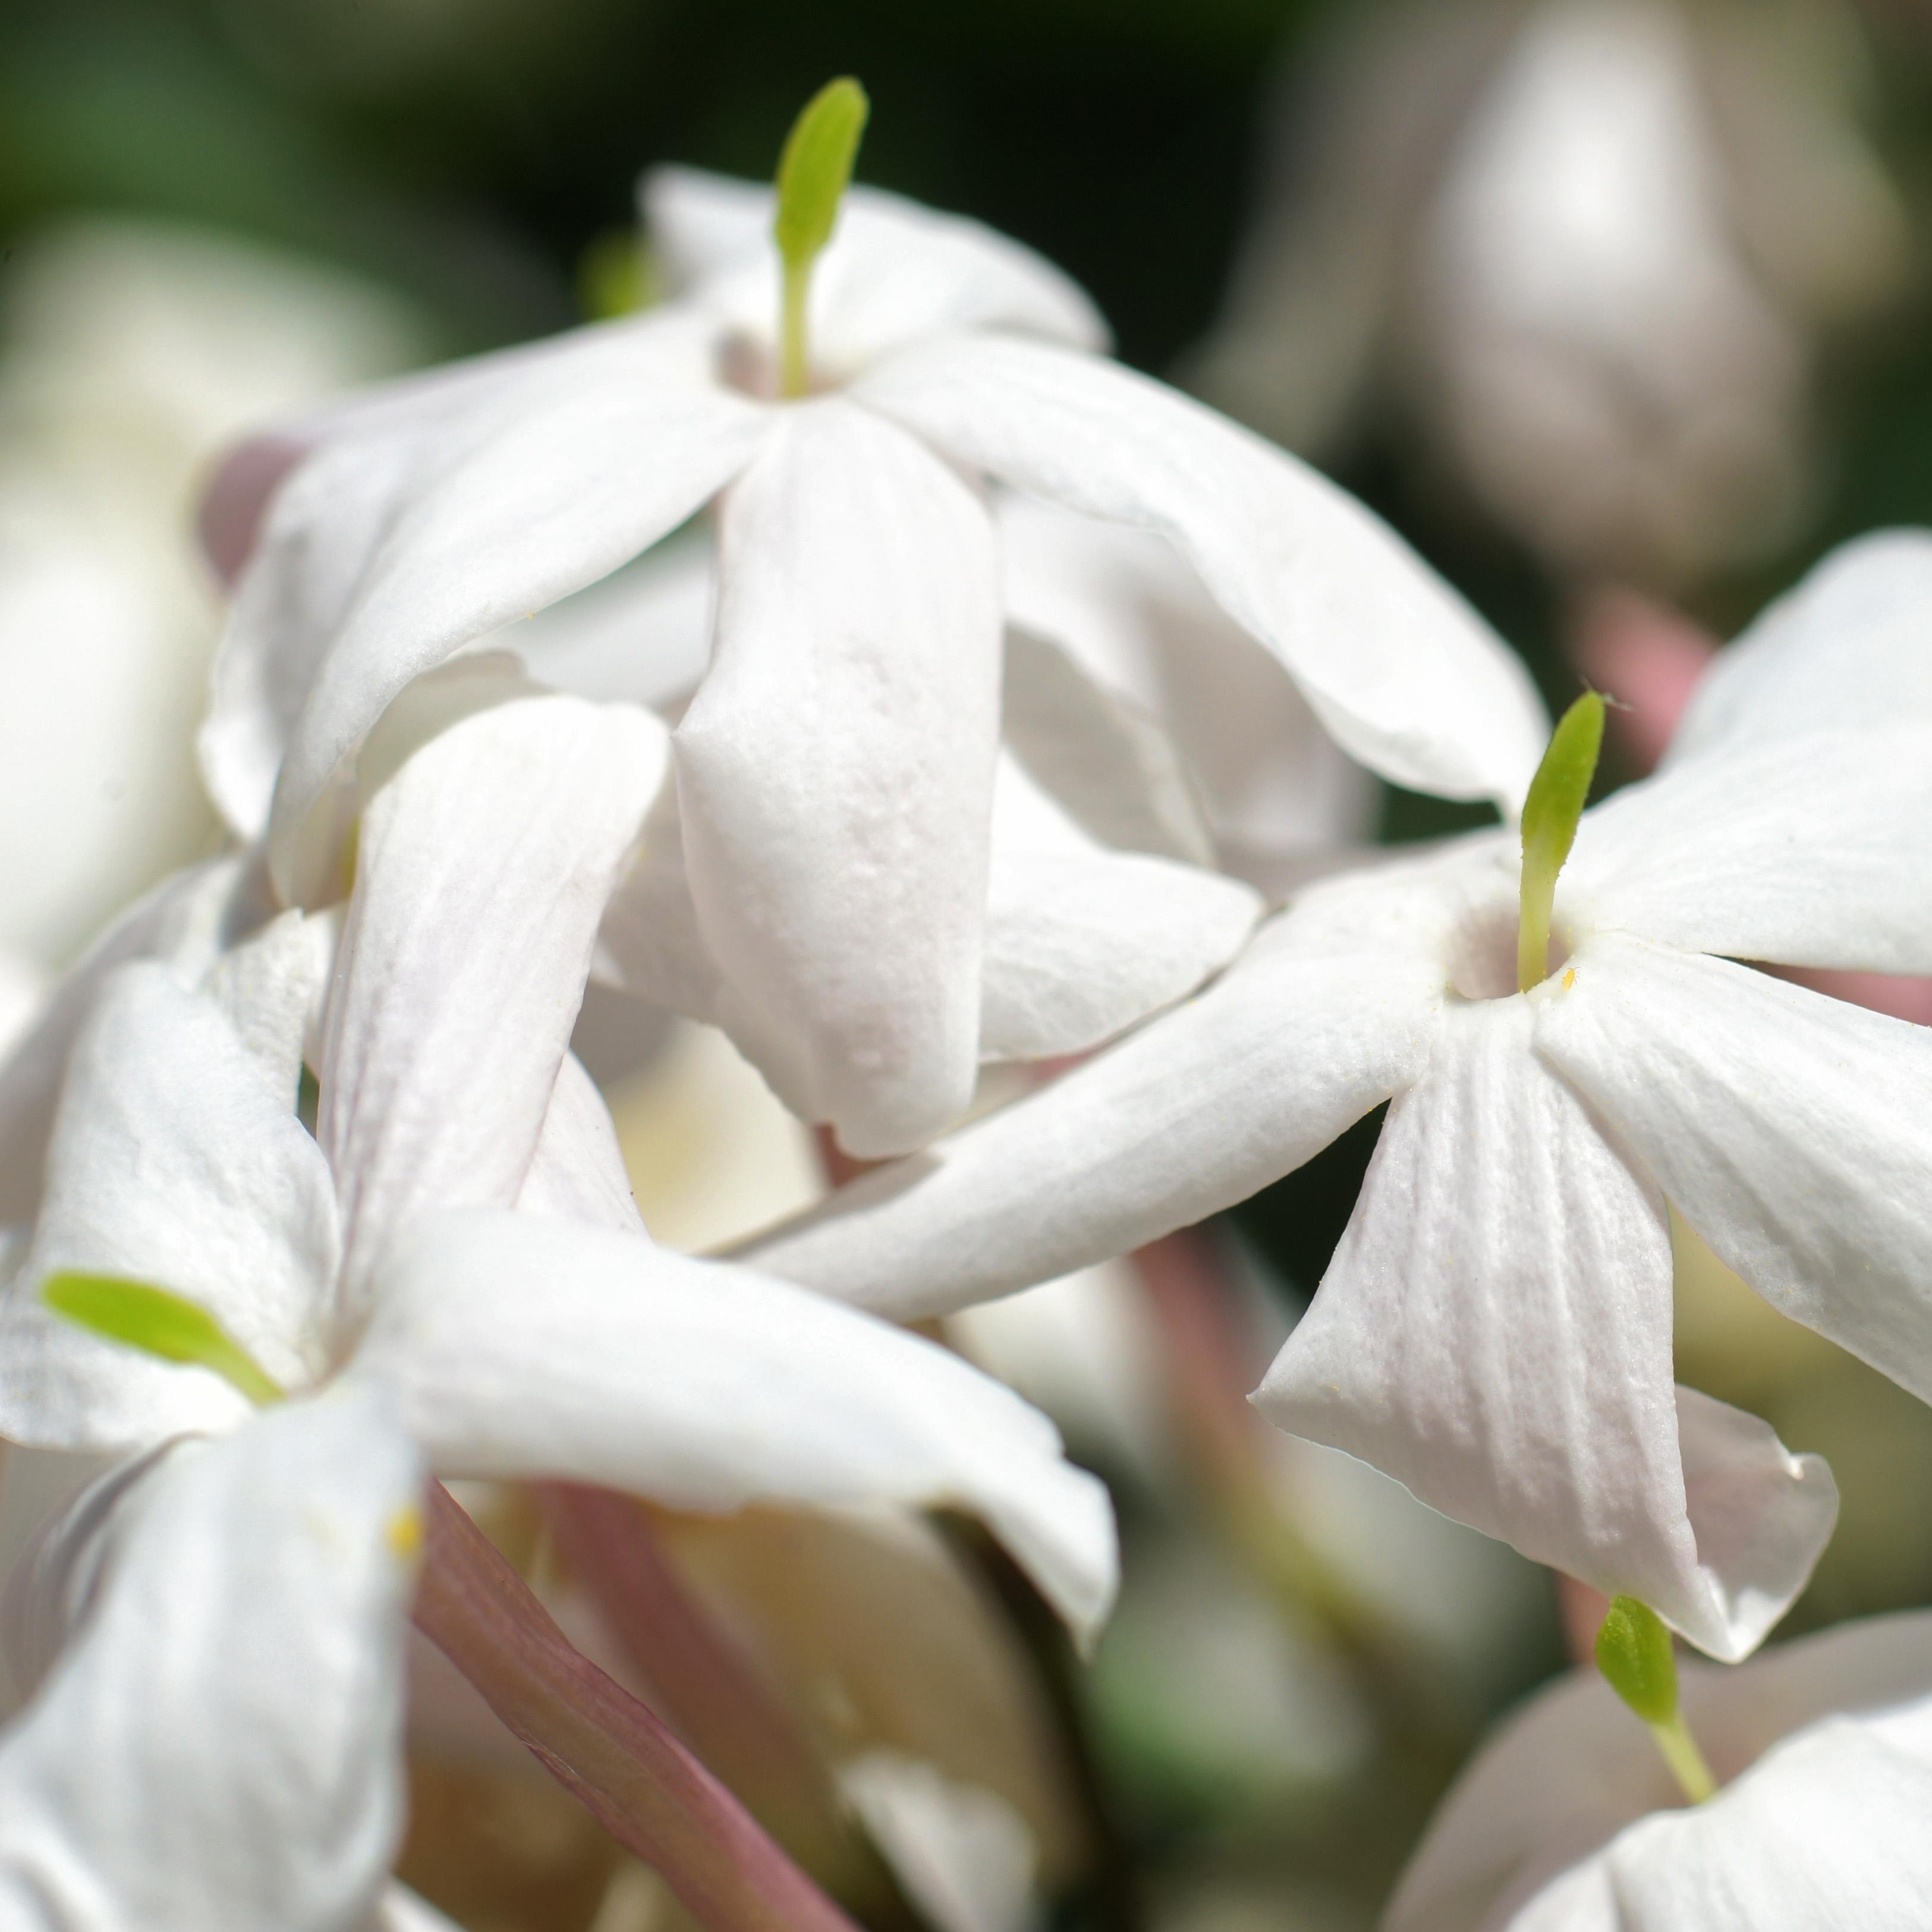 Two More Free Stock Photos Of White Jasmine Flowers